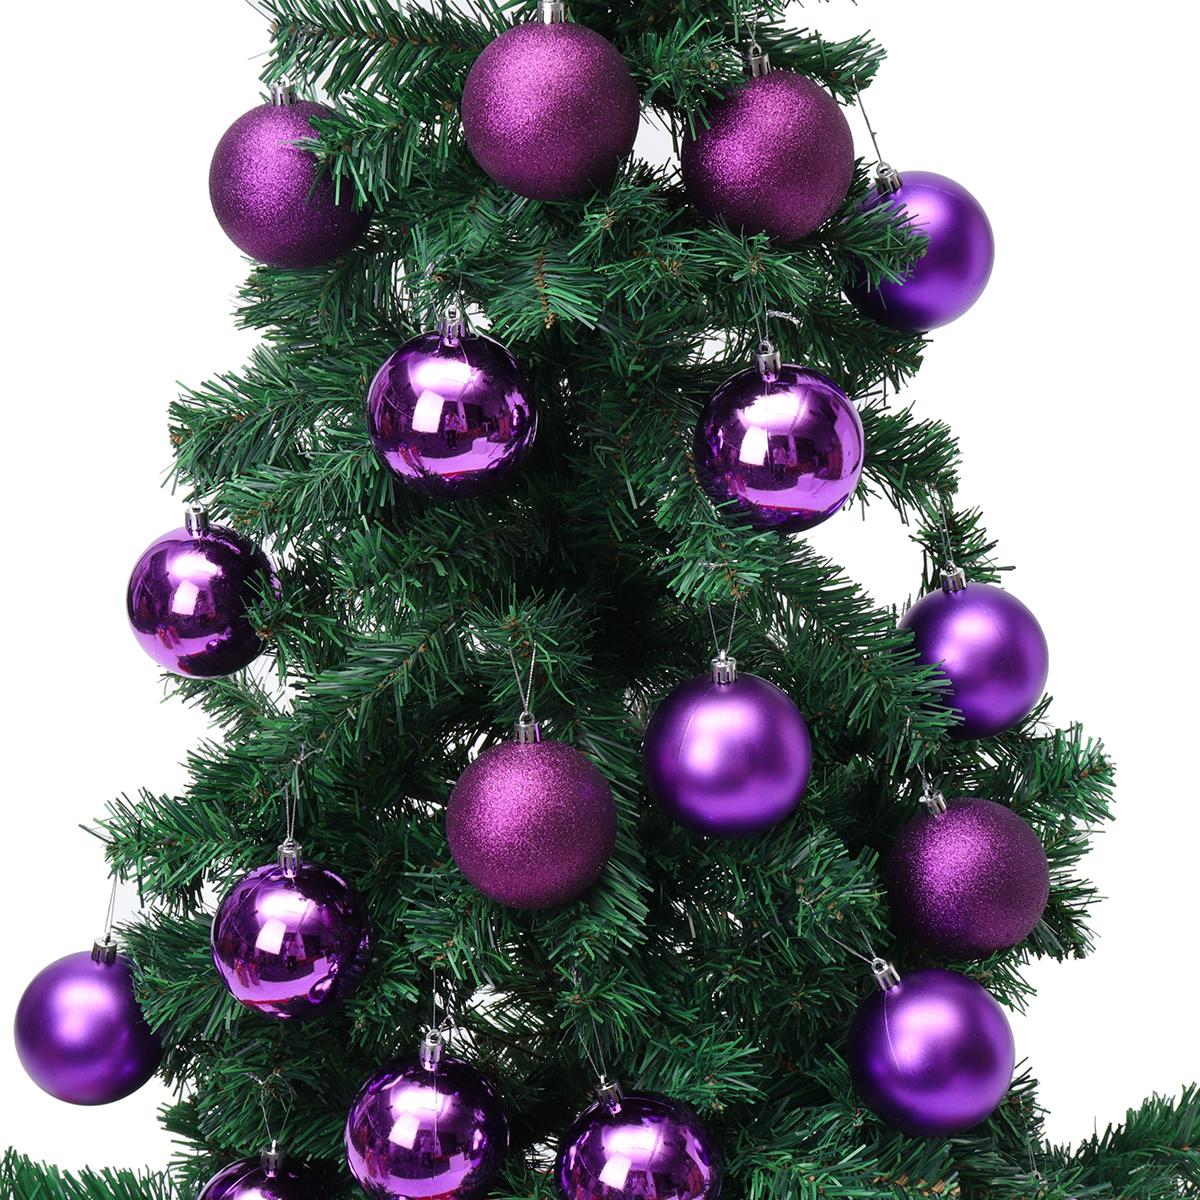 24PCS Merry Christmas Tree Decoration Xmas Balls Ornaments Party Wedding Gift